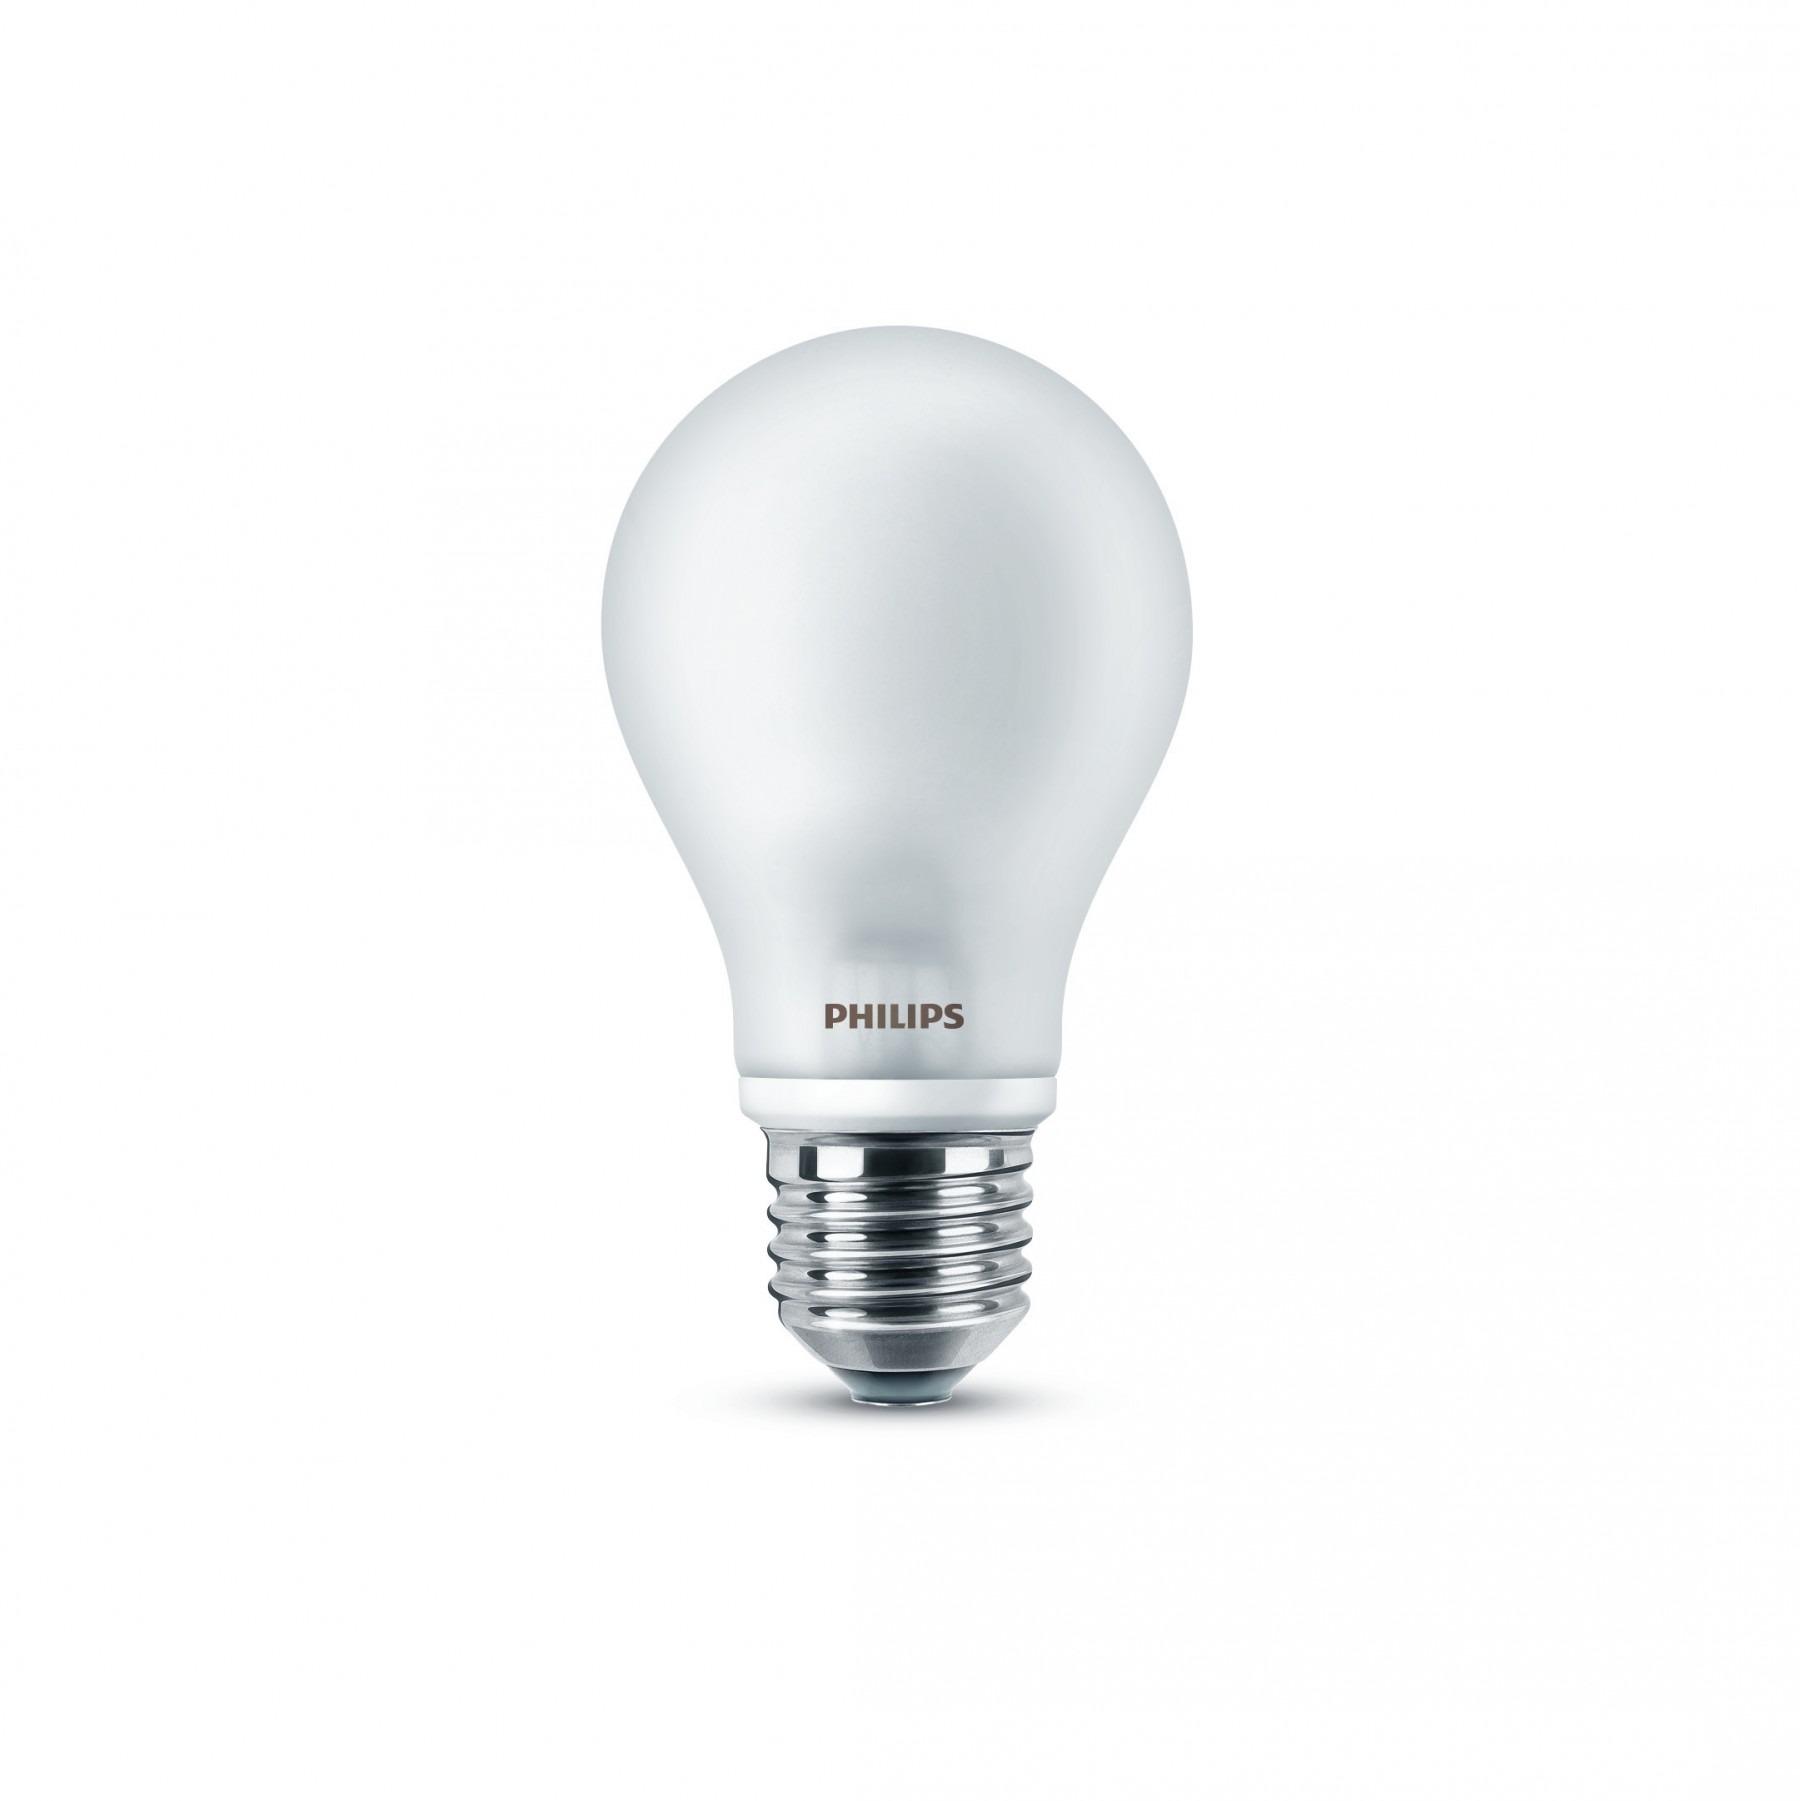 Philipe LEDclassic Birne 7 Watt